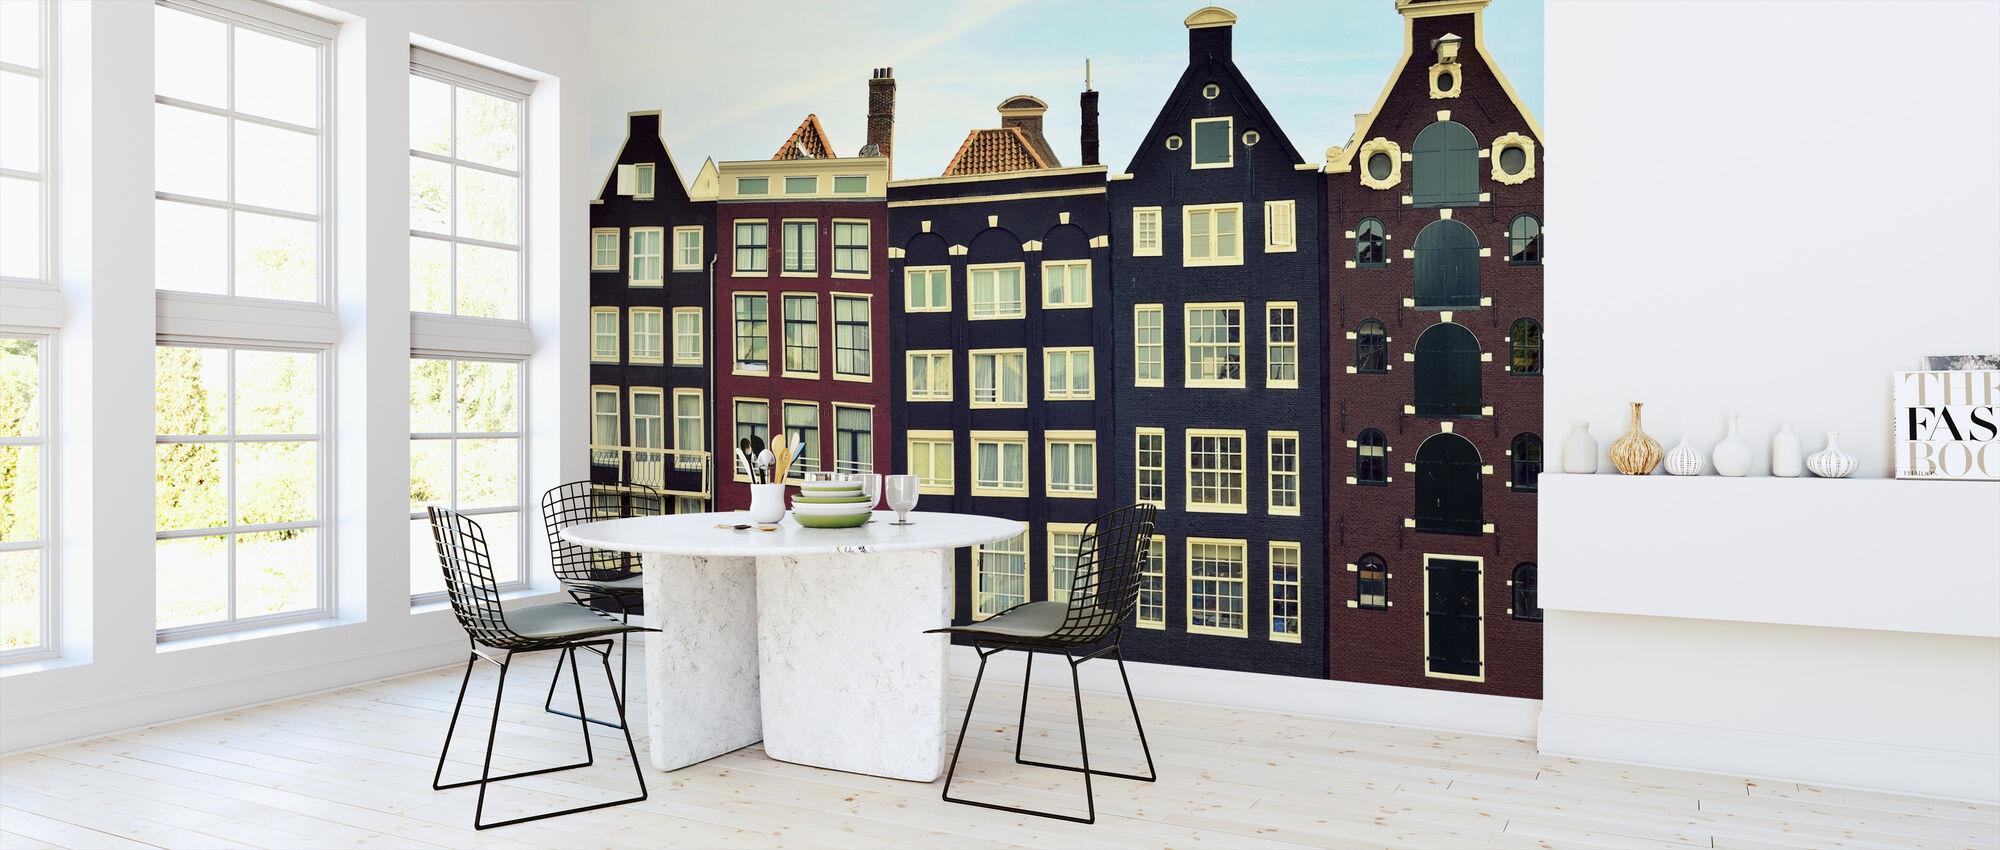 Amsterdam Houses - Wallpaper - Kitchen